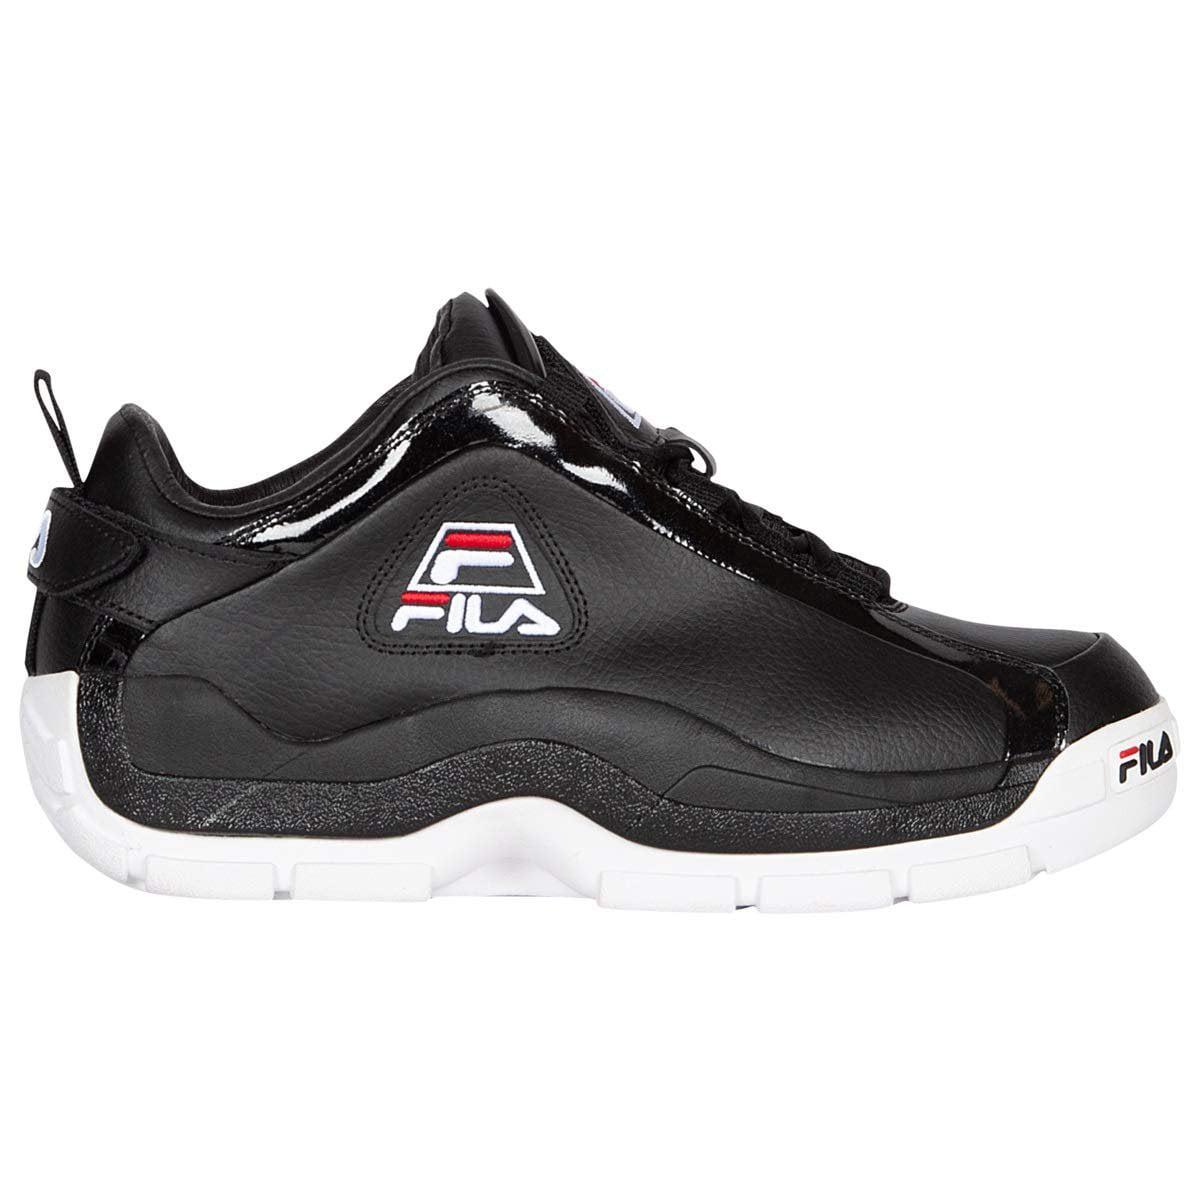 fila basketball shoes grant hill